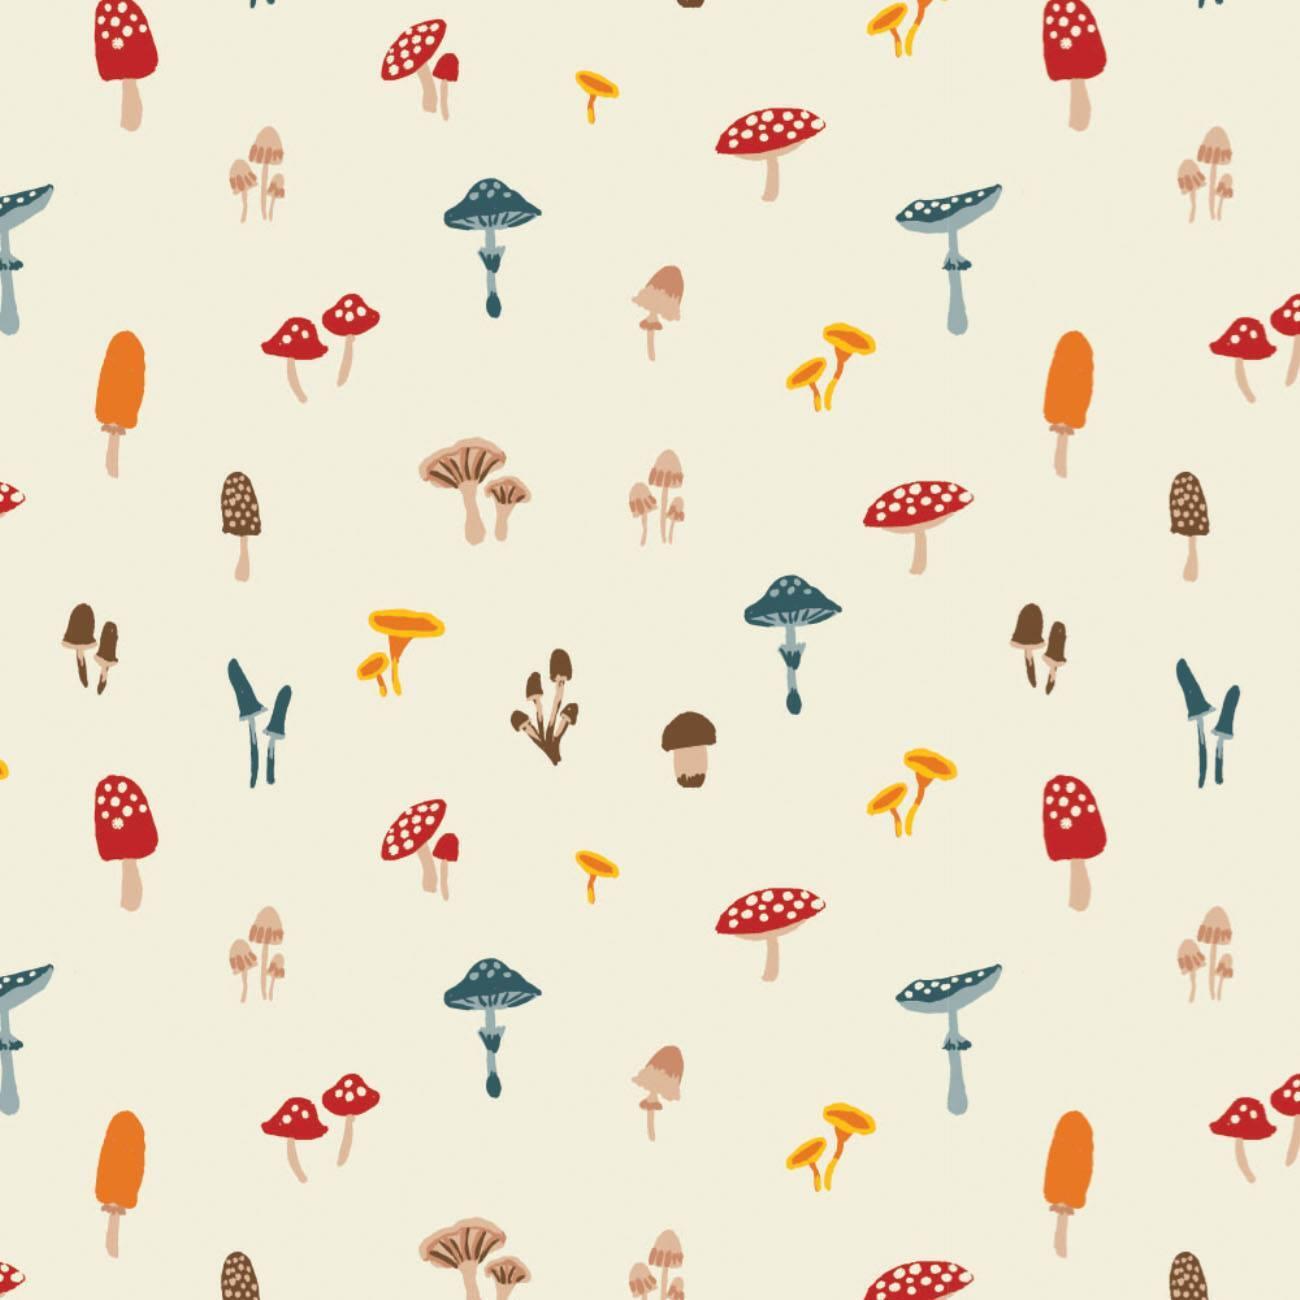 Sweater Weather - Cream Mushrooms - 1/2m cut 58055